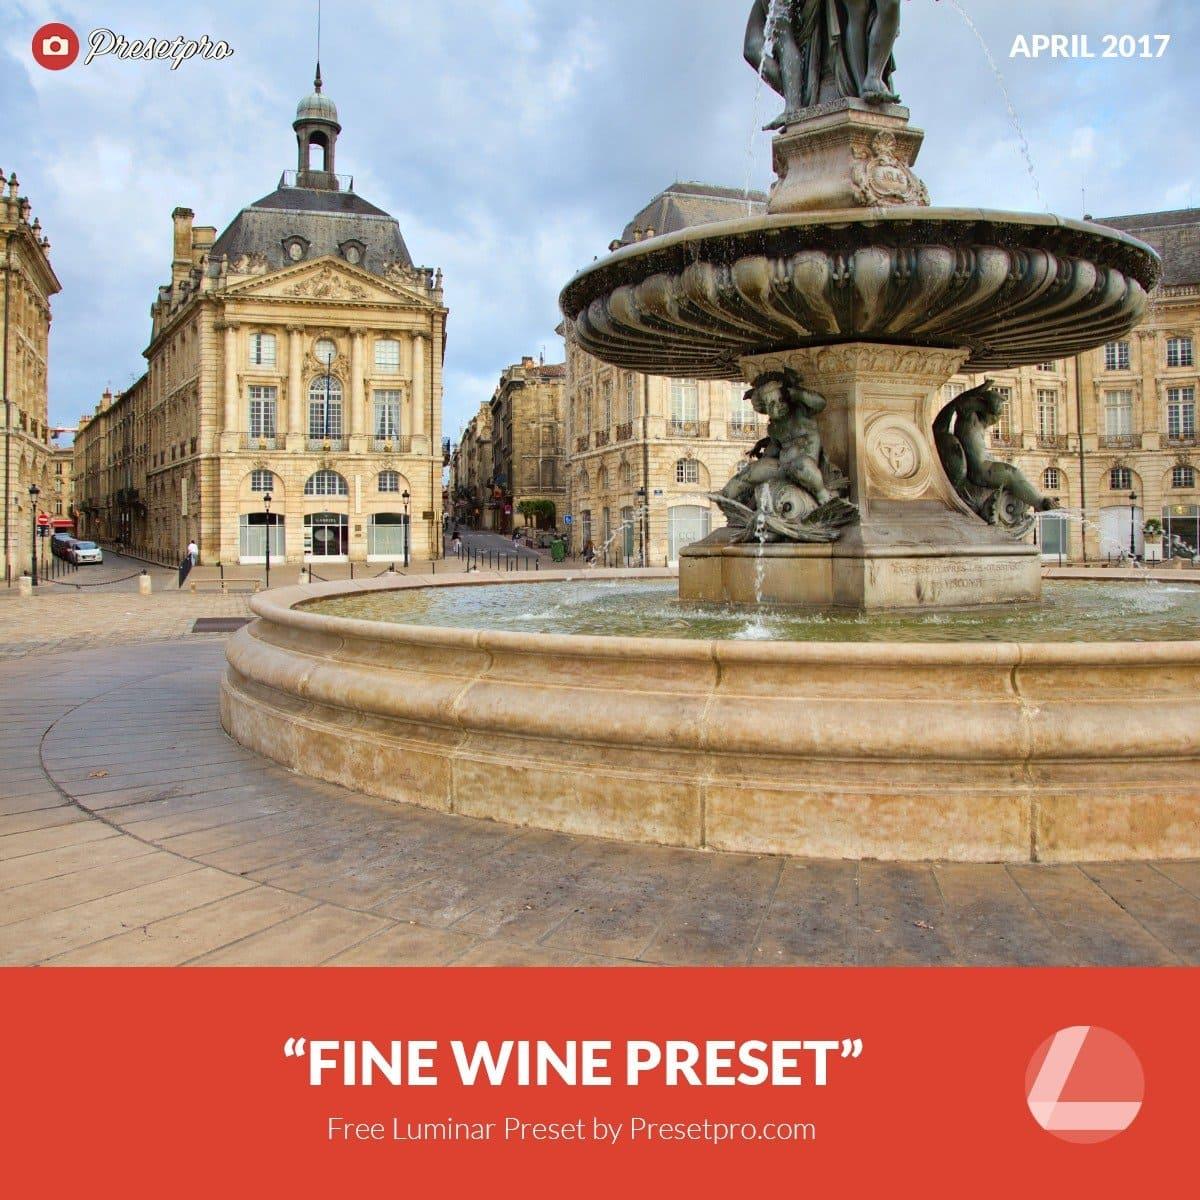 Free-Luminar-Preset-Fine-Wine-Presetpro.com